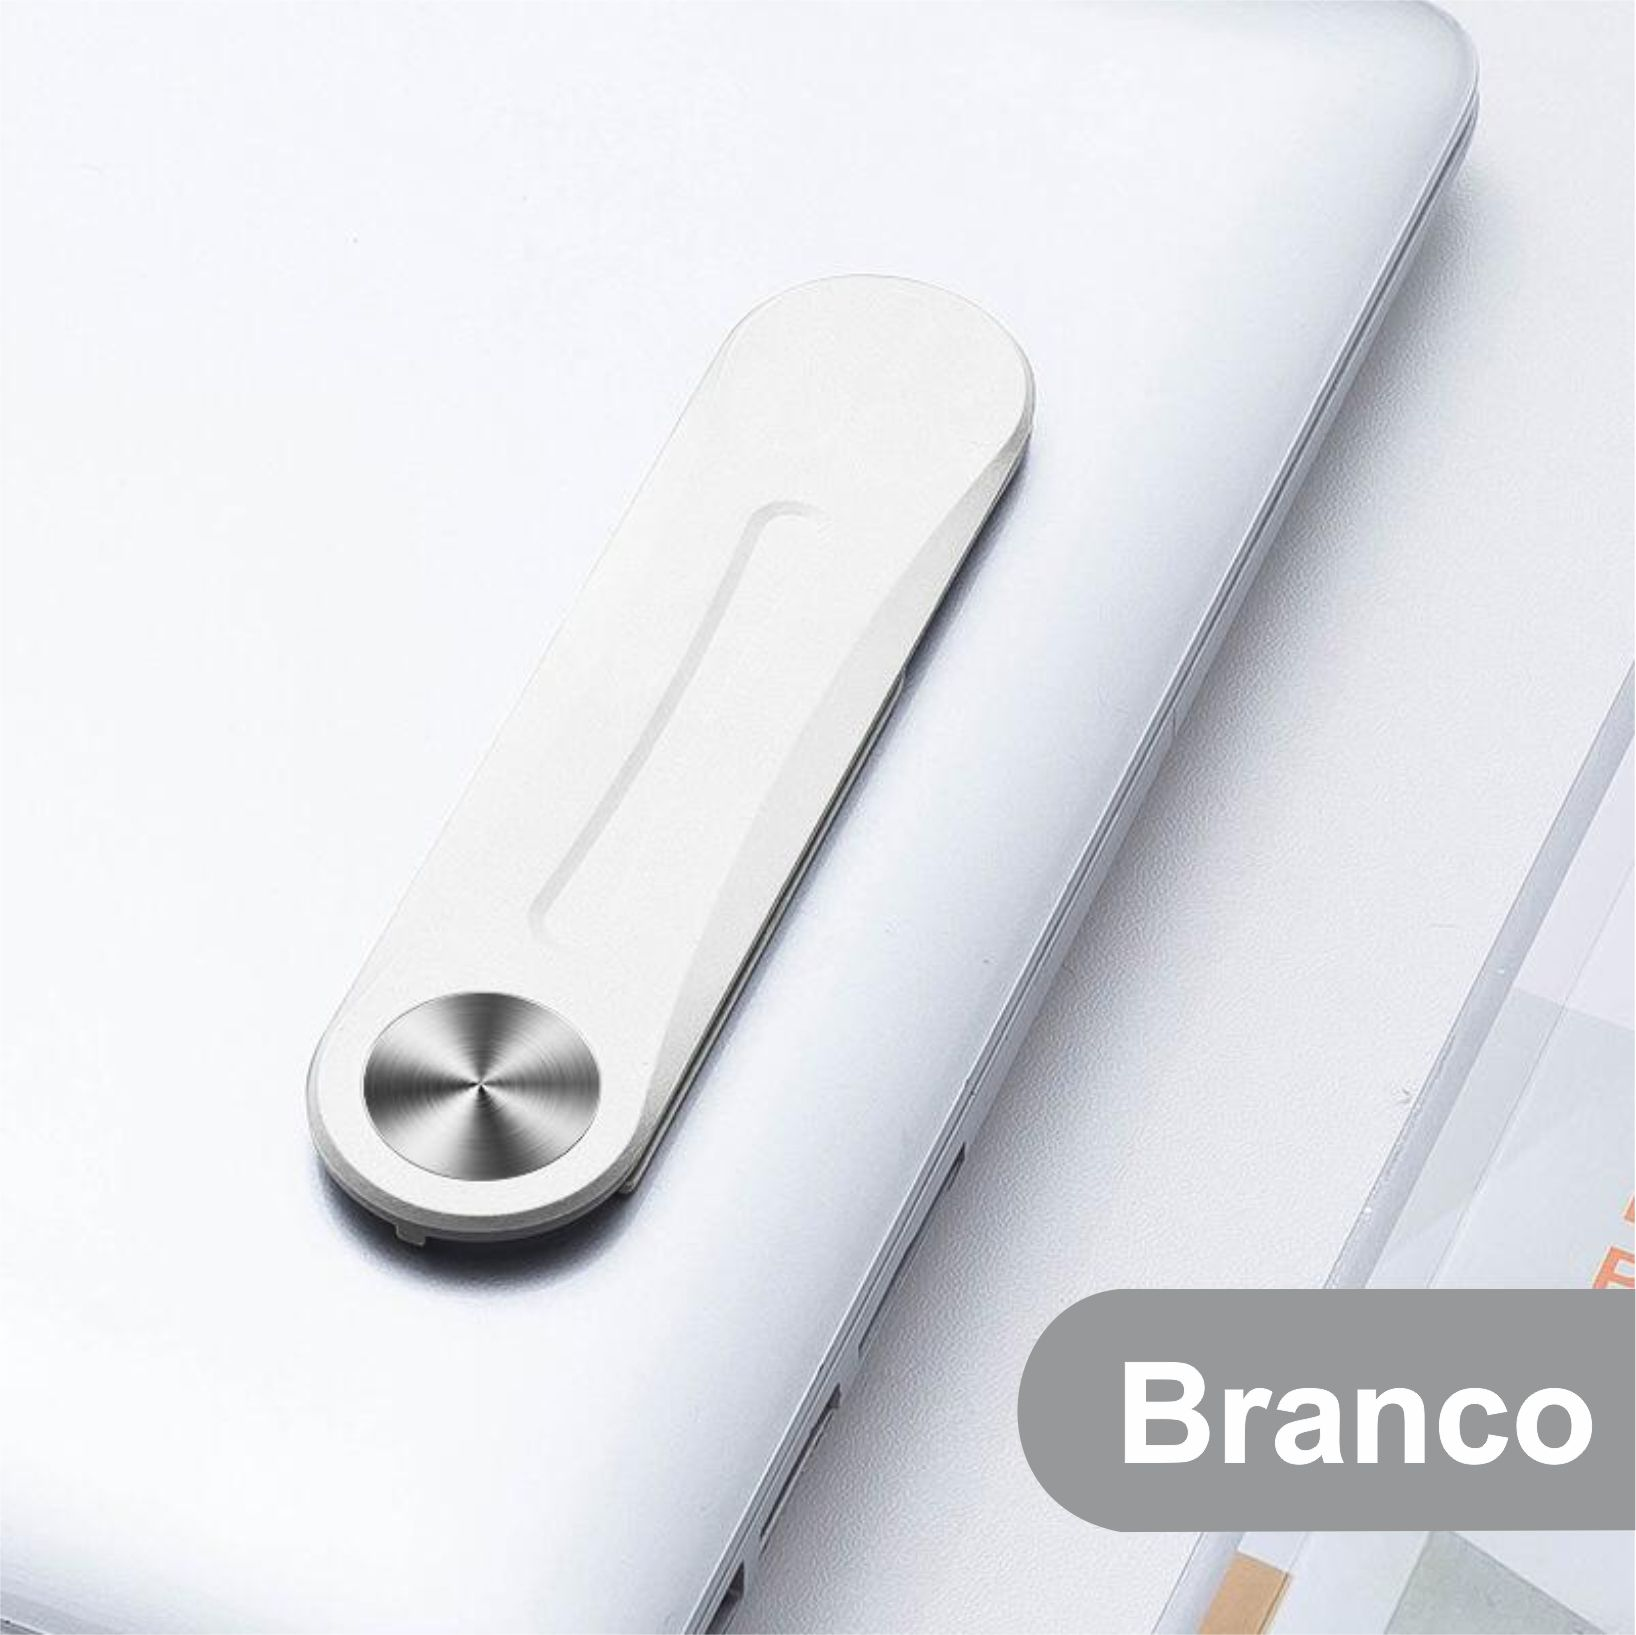 Suporte magnético de Celular para prender na tela de notebook, Laptop, computador, tablet.